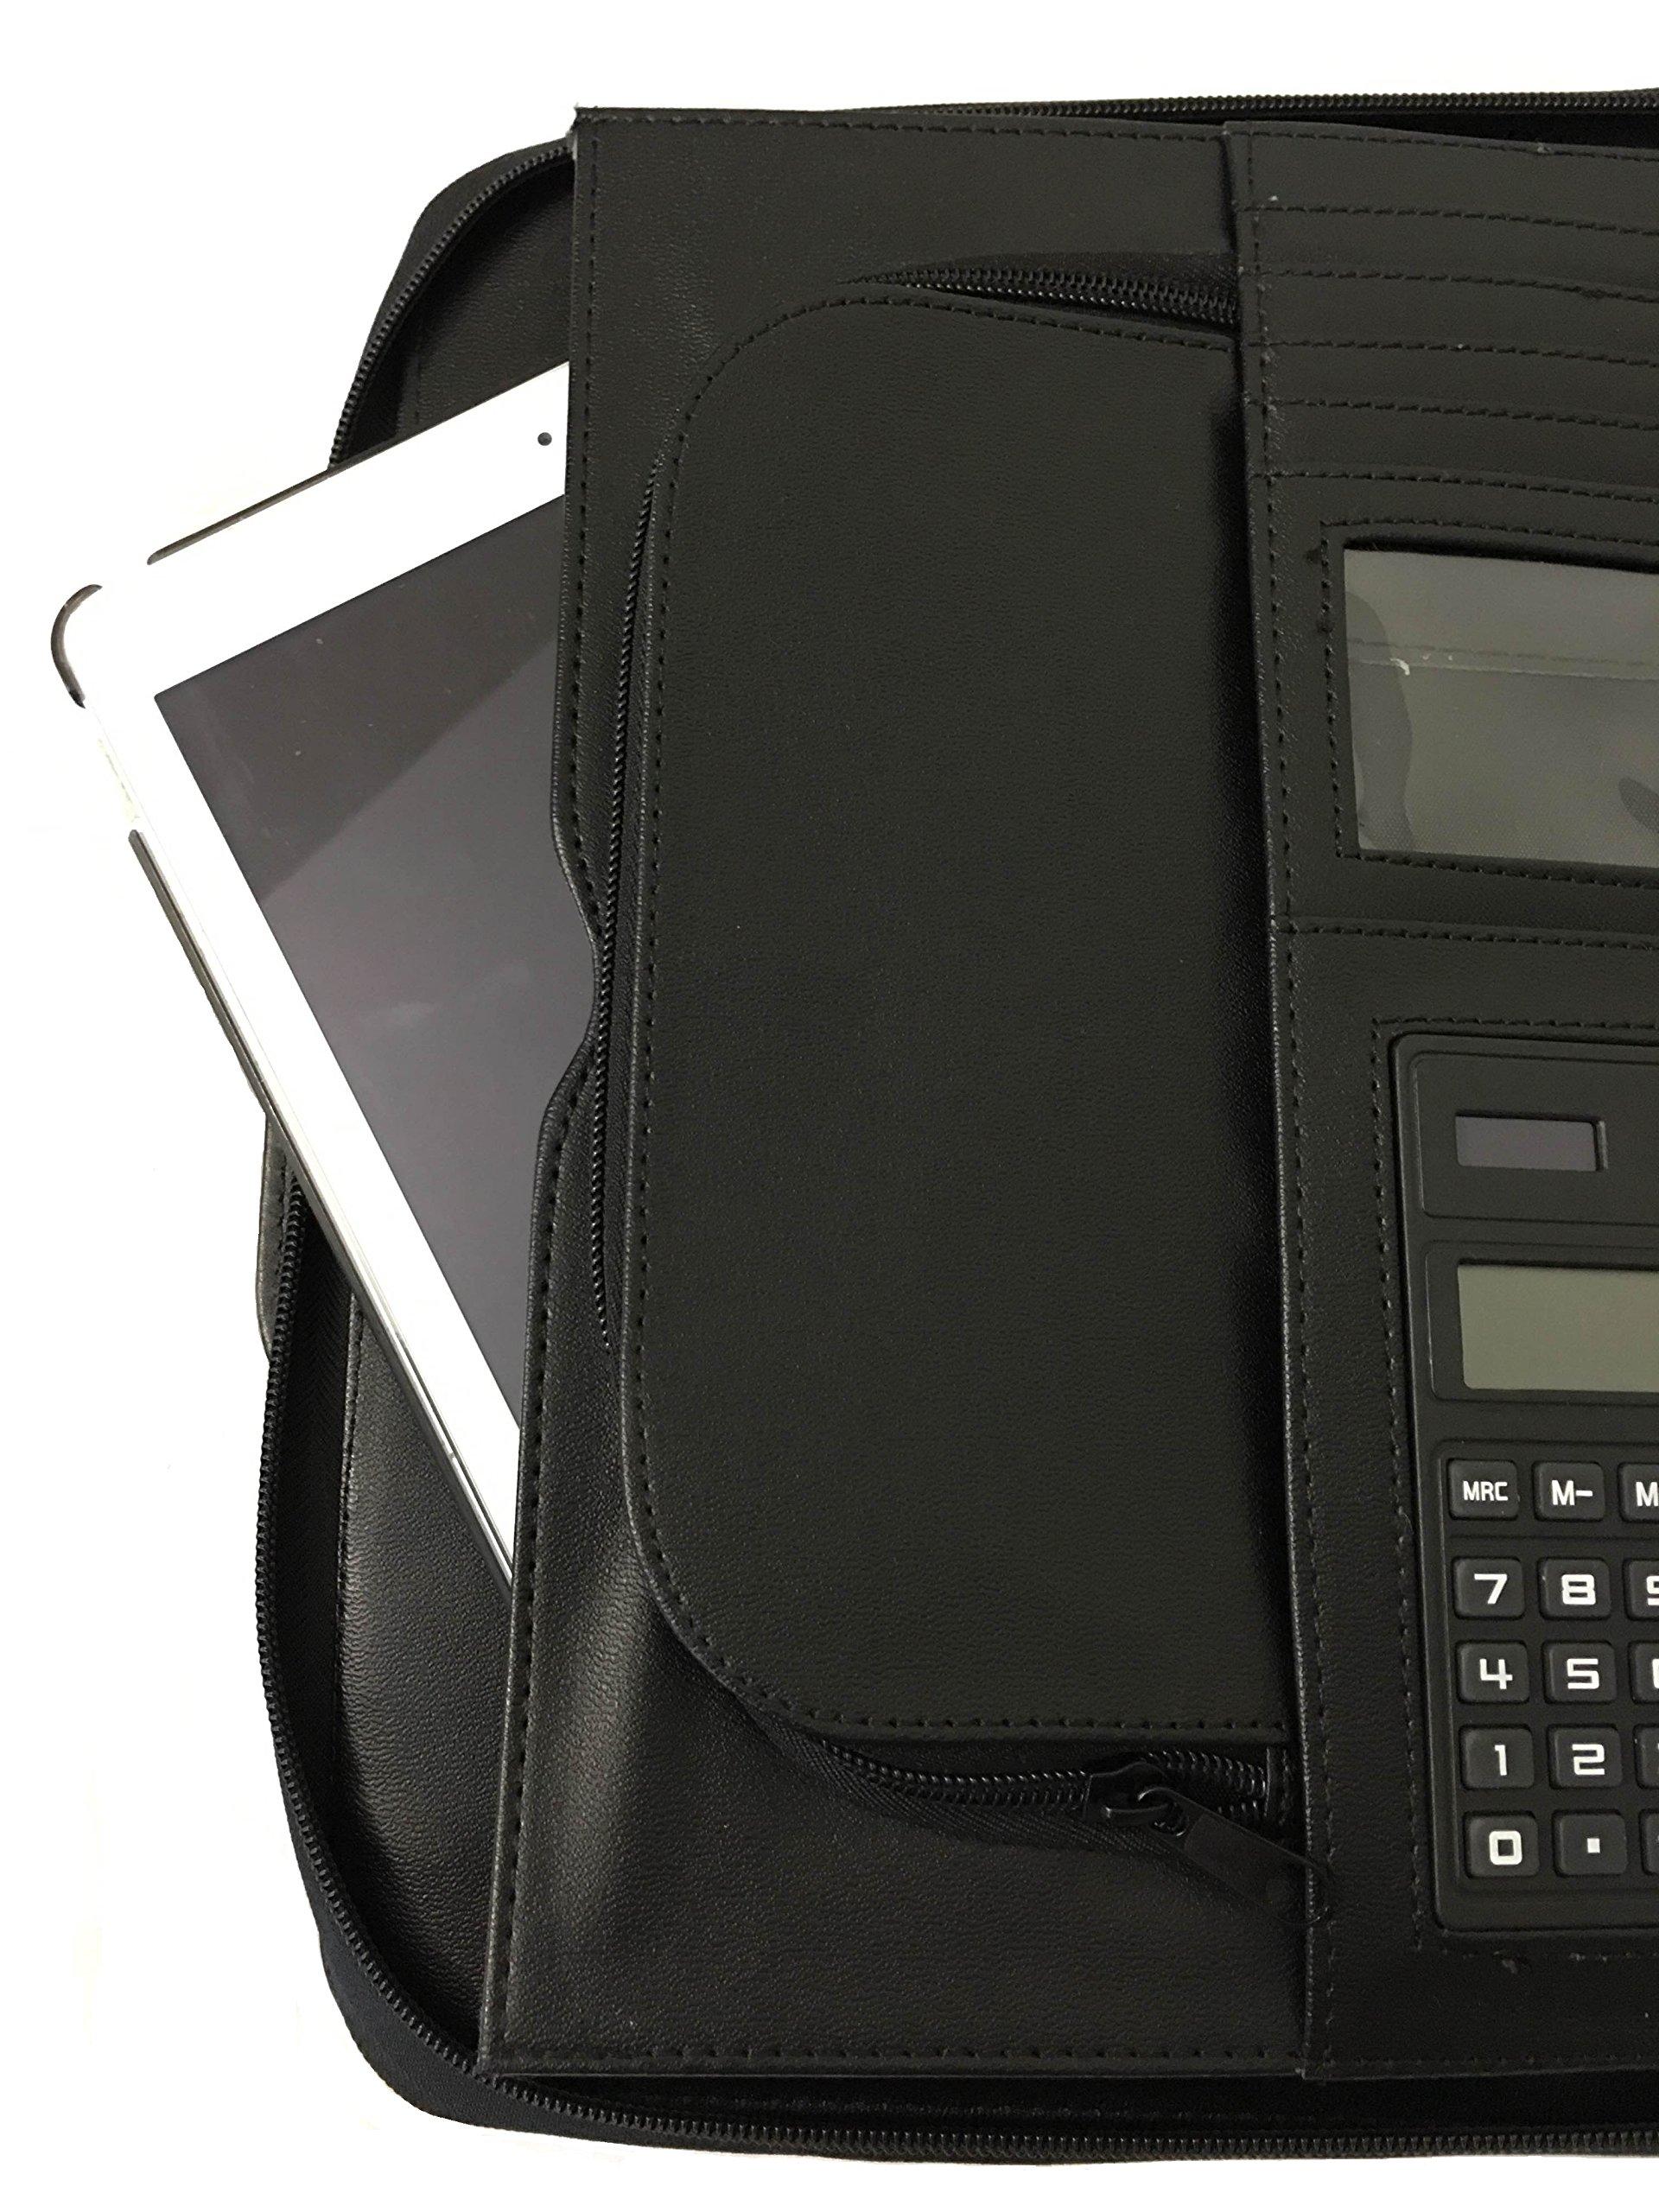 ImpecGear Briefcase Binder Portfolio, Carry Cases, Office Padfolio, School Portfolio (Black)